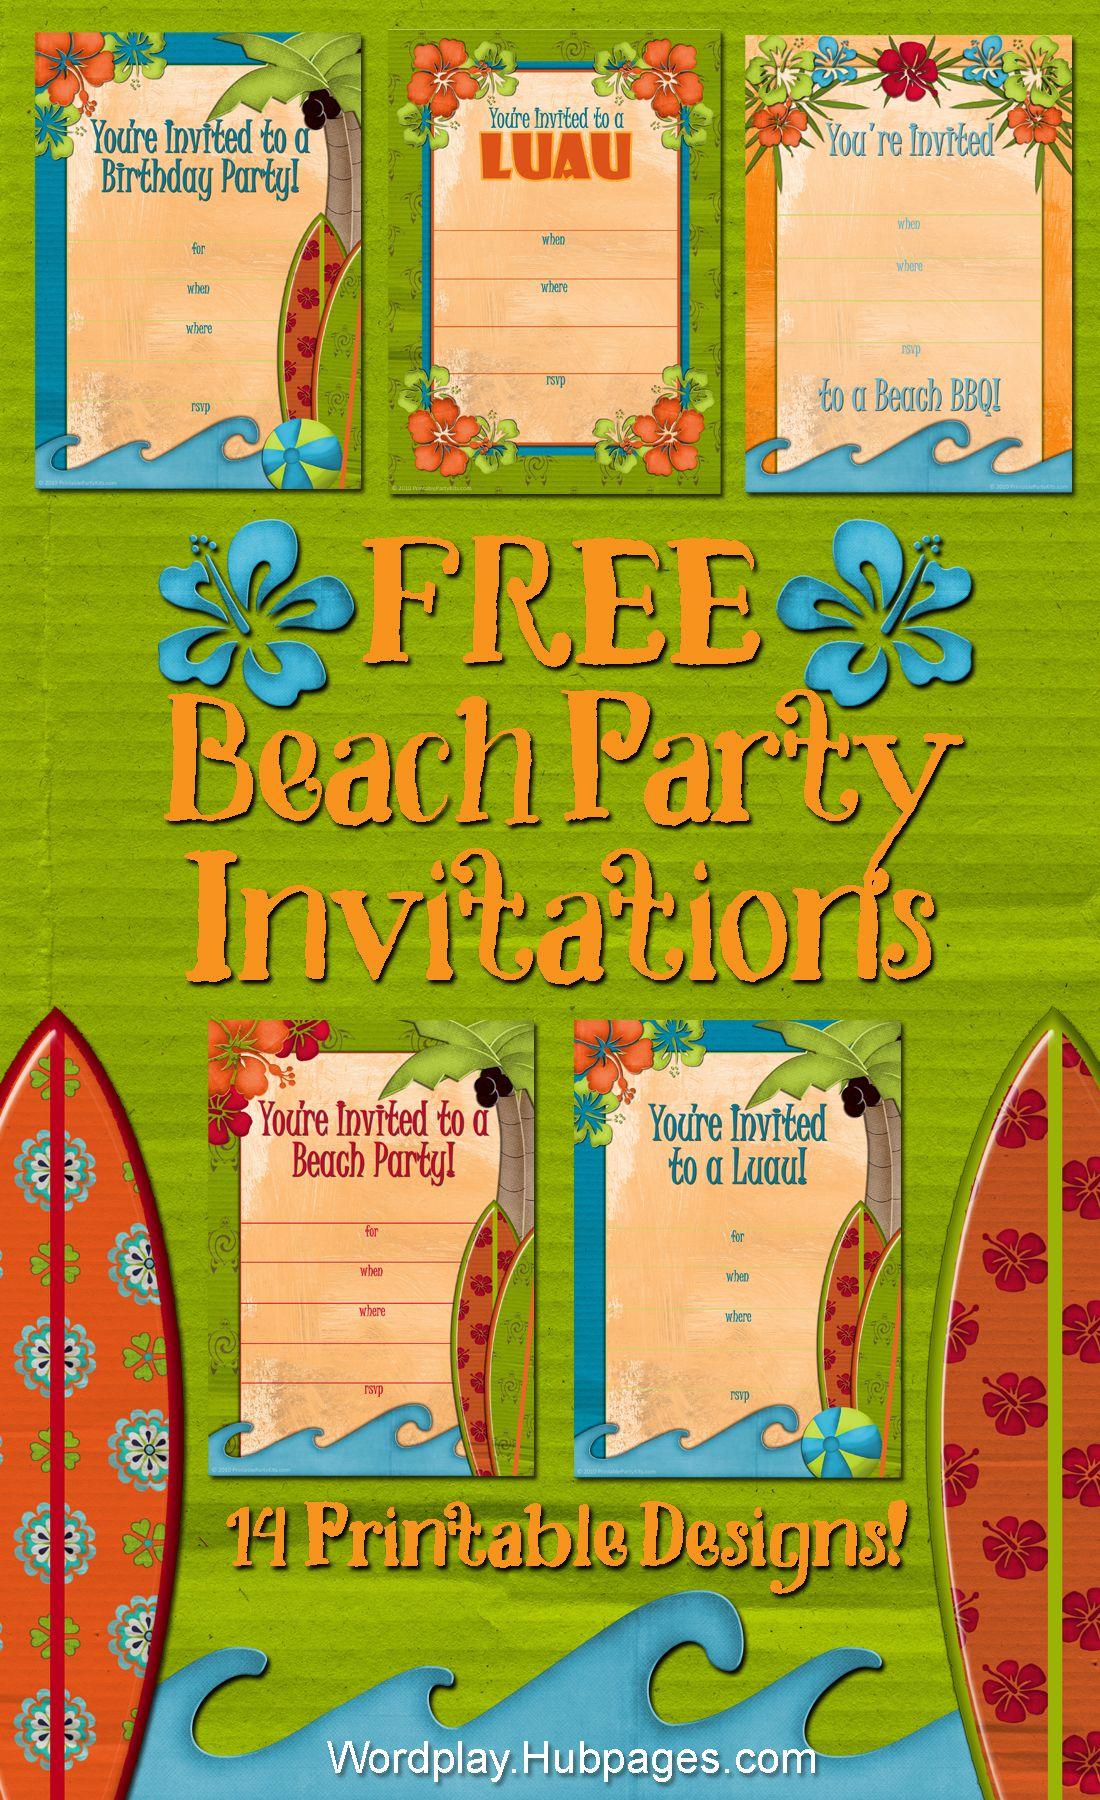 Free Printable Beach Party Luau And Bbq Invitations Templates